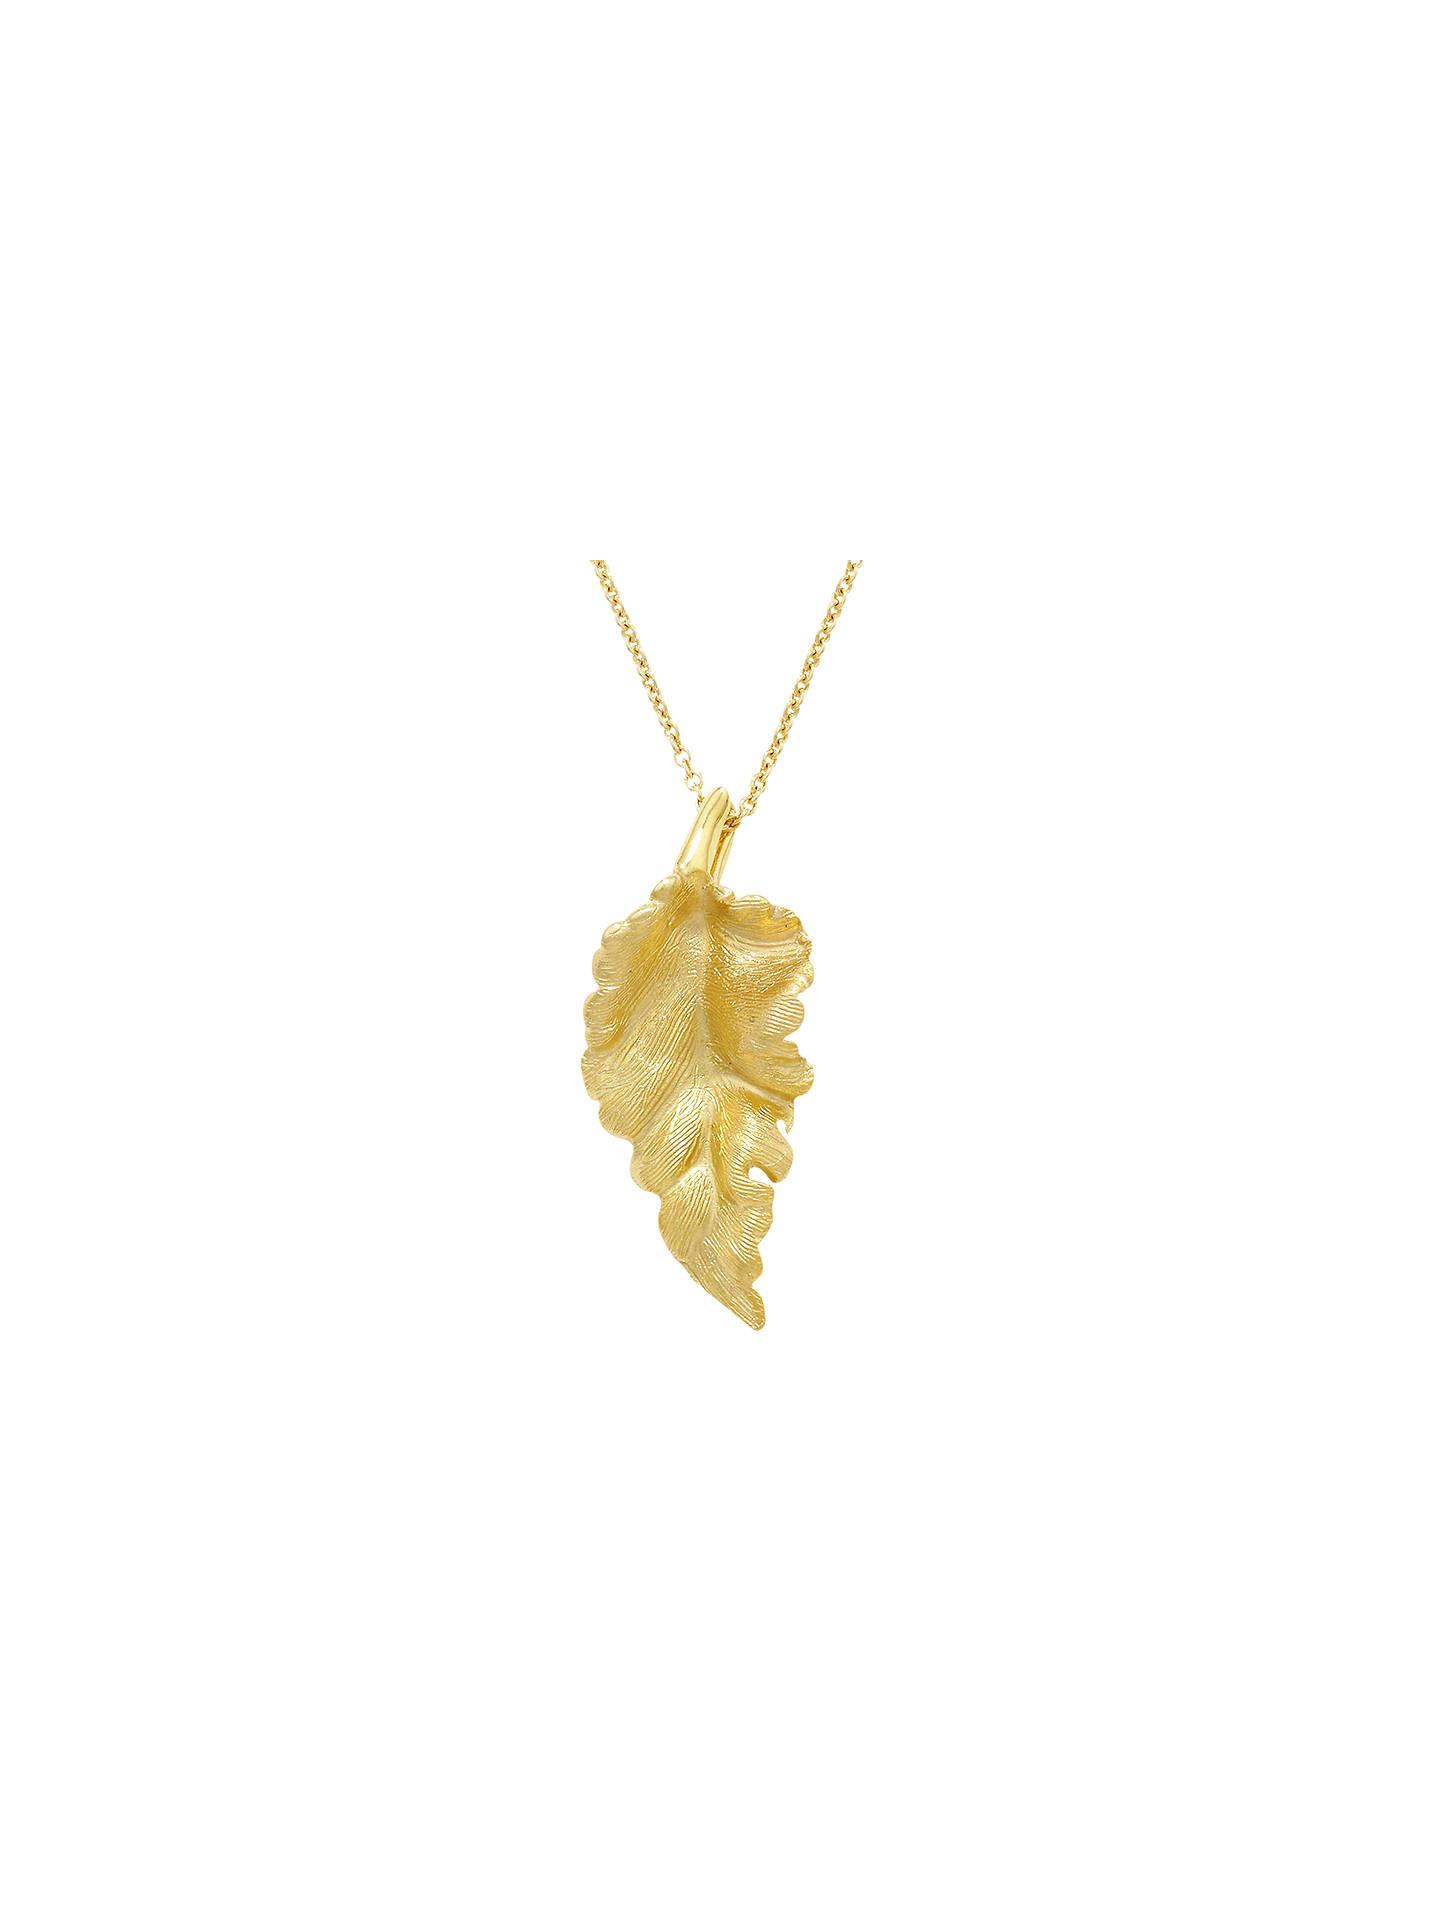 London Road 9ct Gold Leaf Pendant Necklace